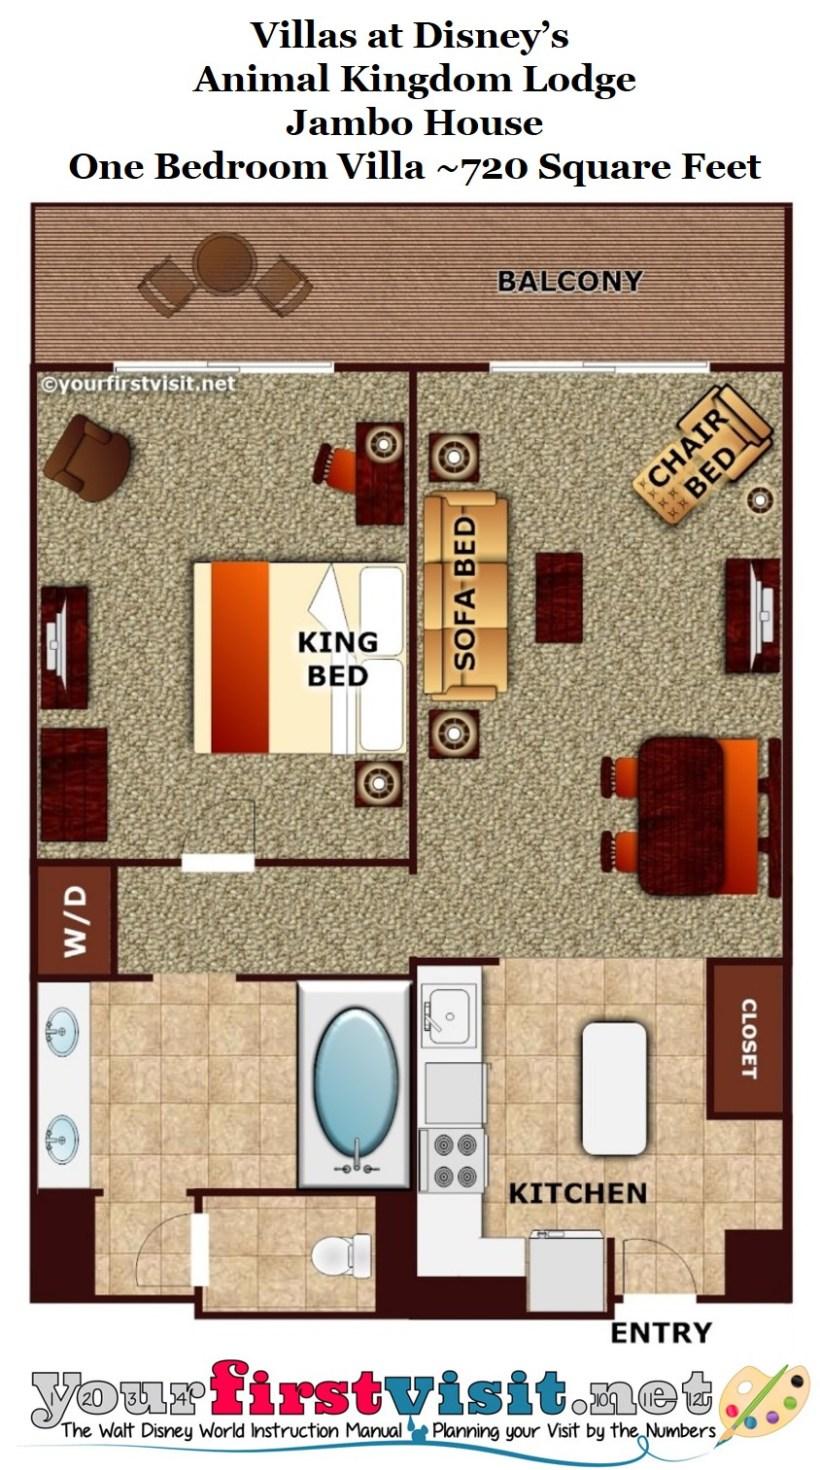 Animal Kingdom Lodge 2 Bedroom Villa Jambo House